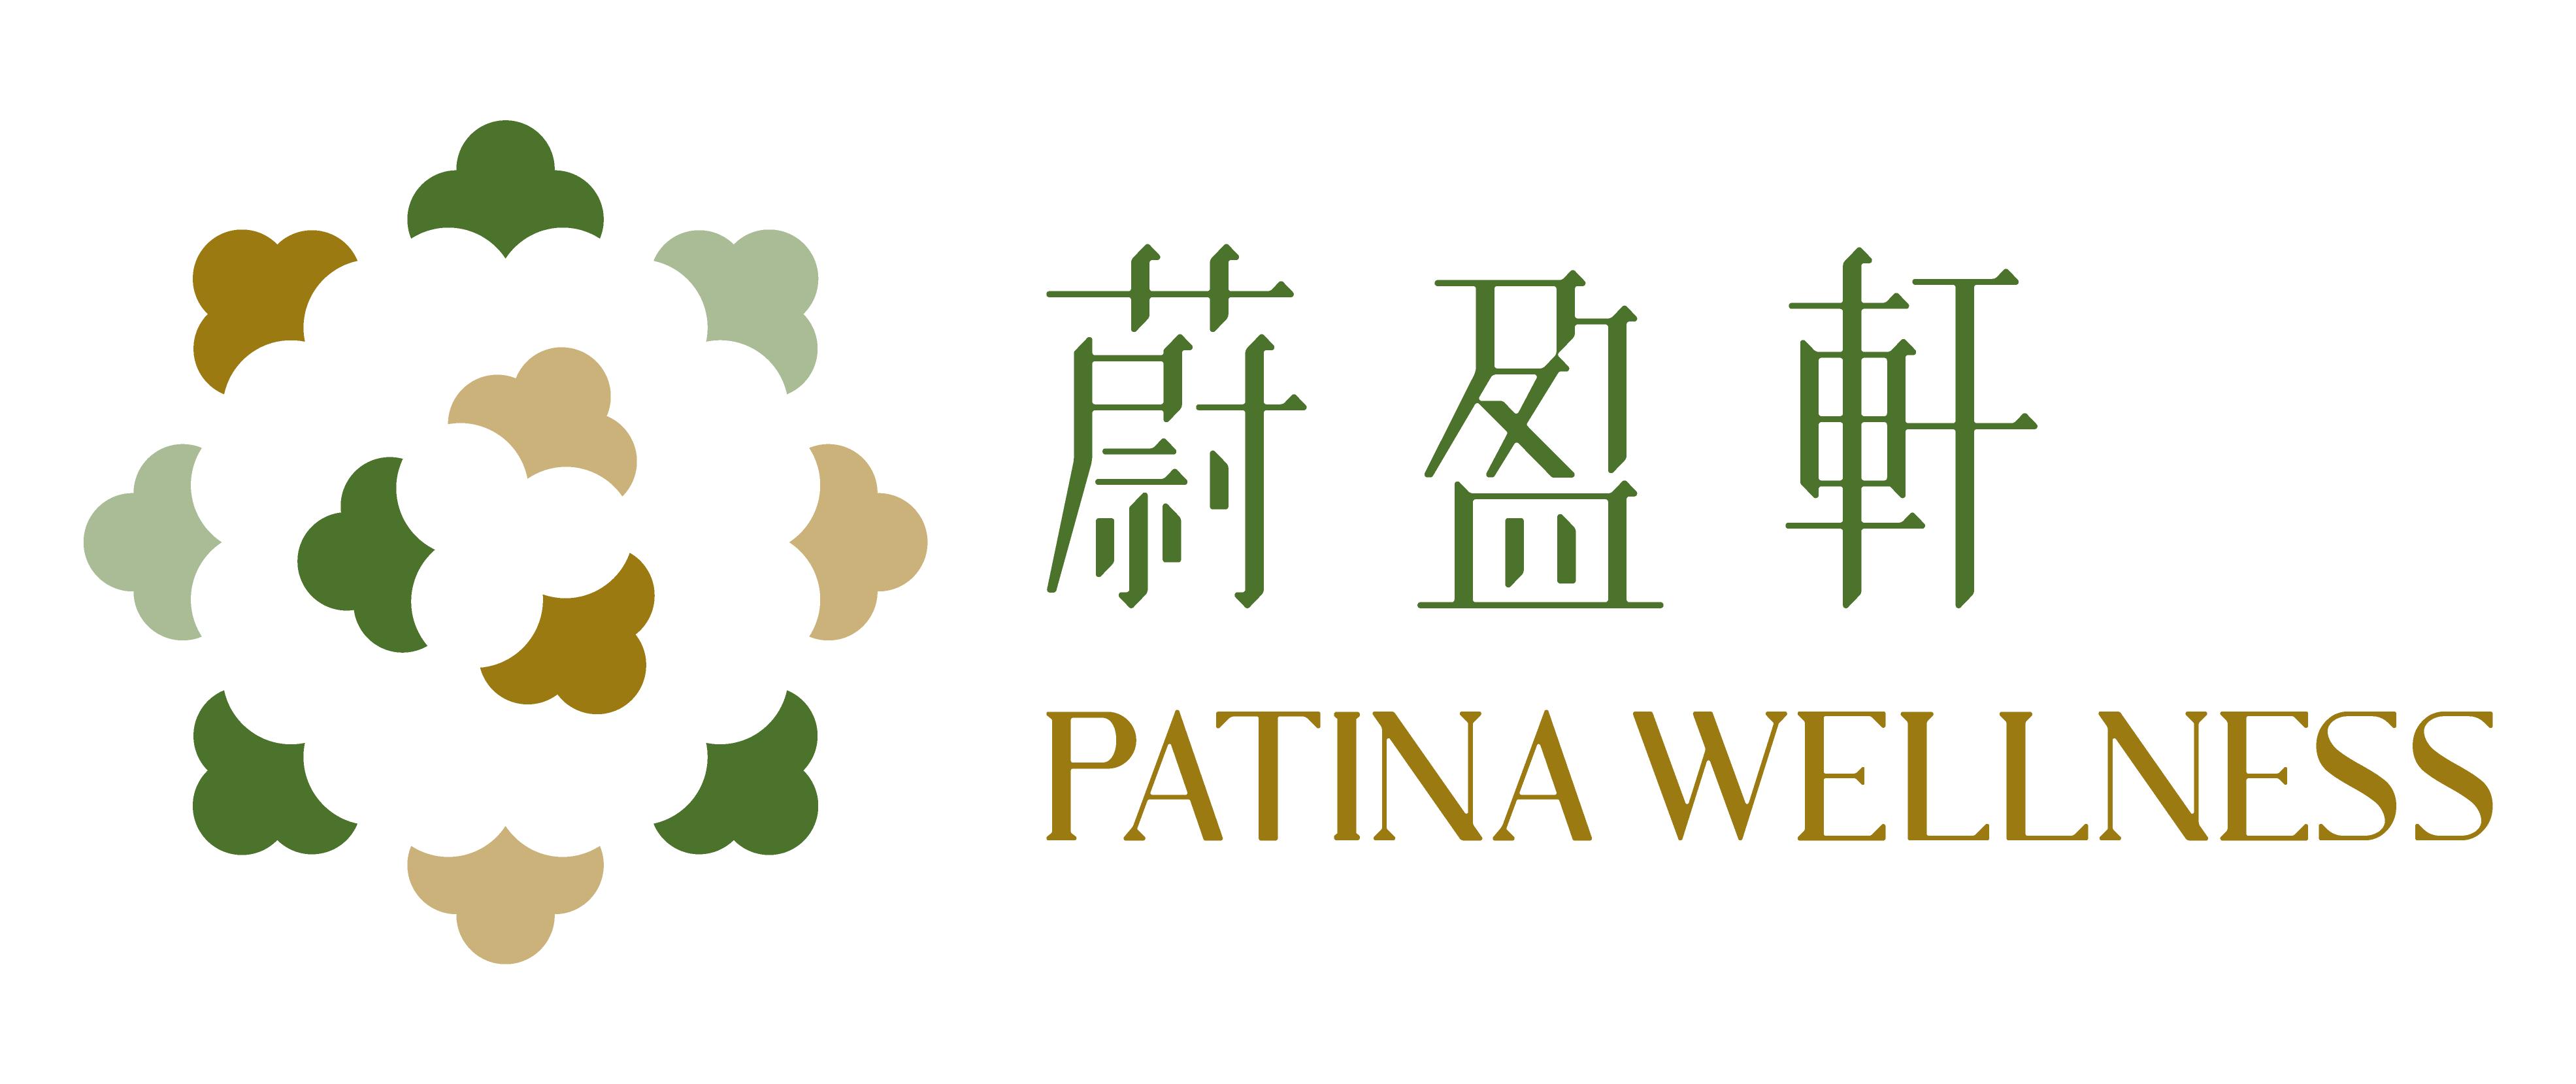 PatinaWellness_logo